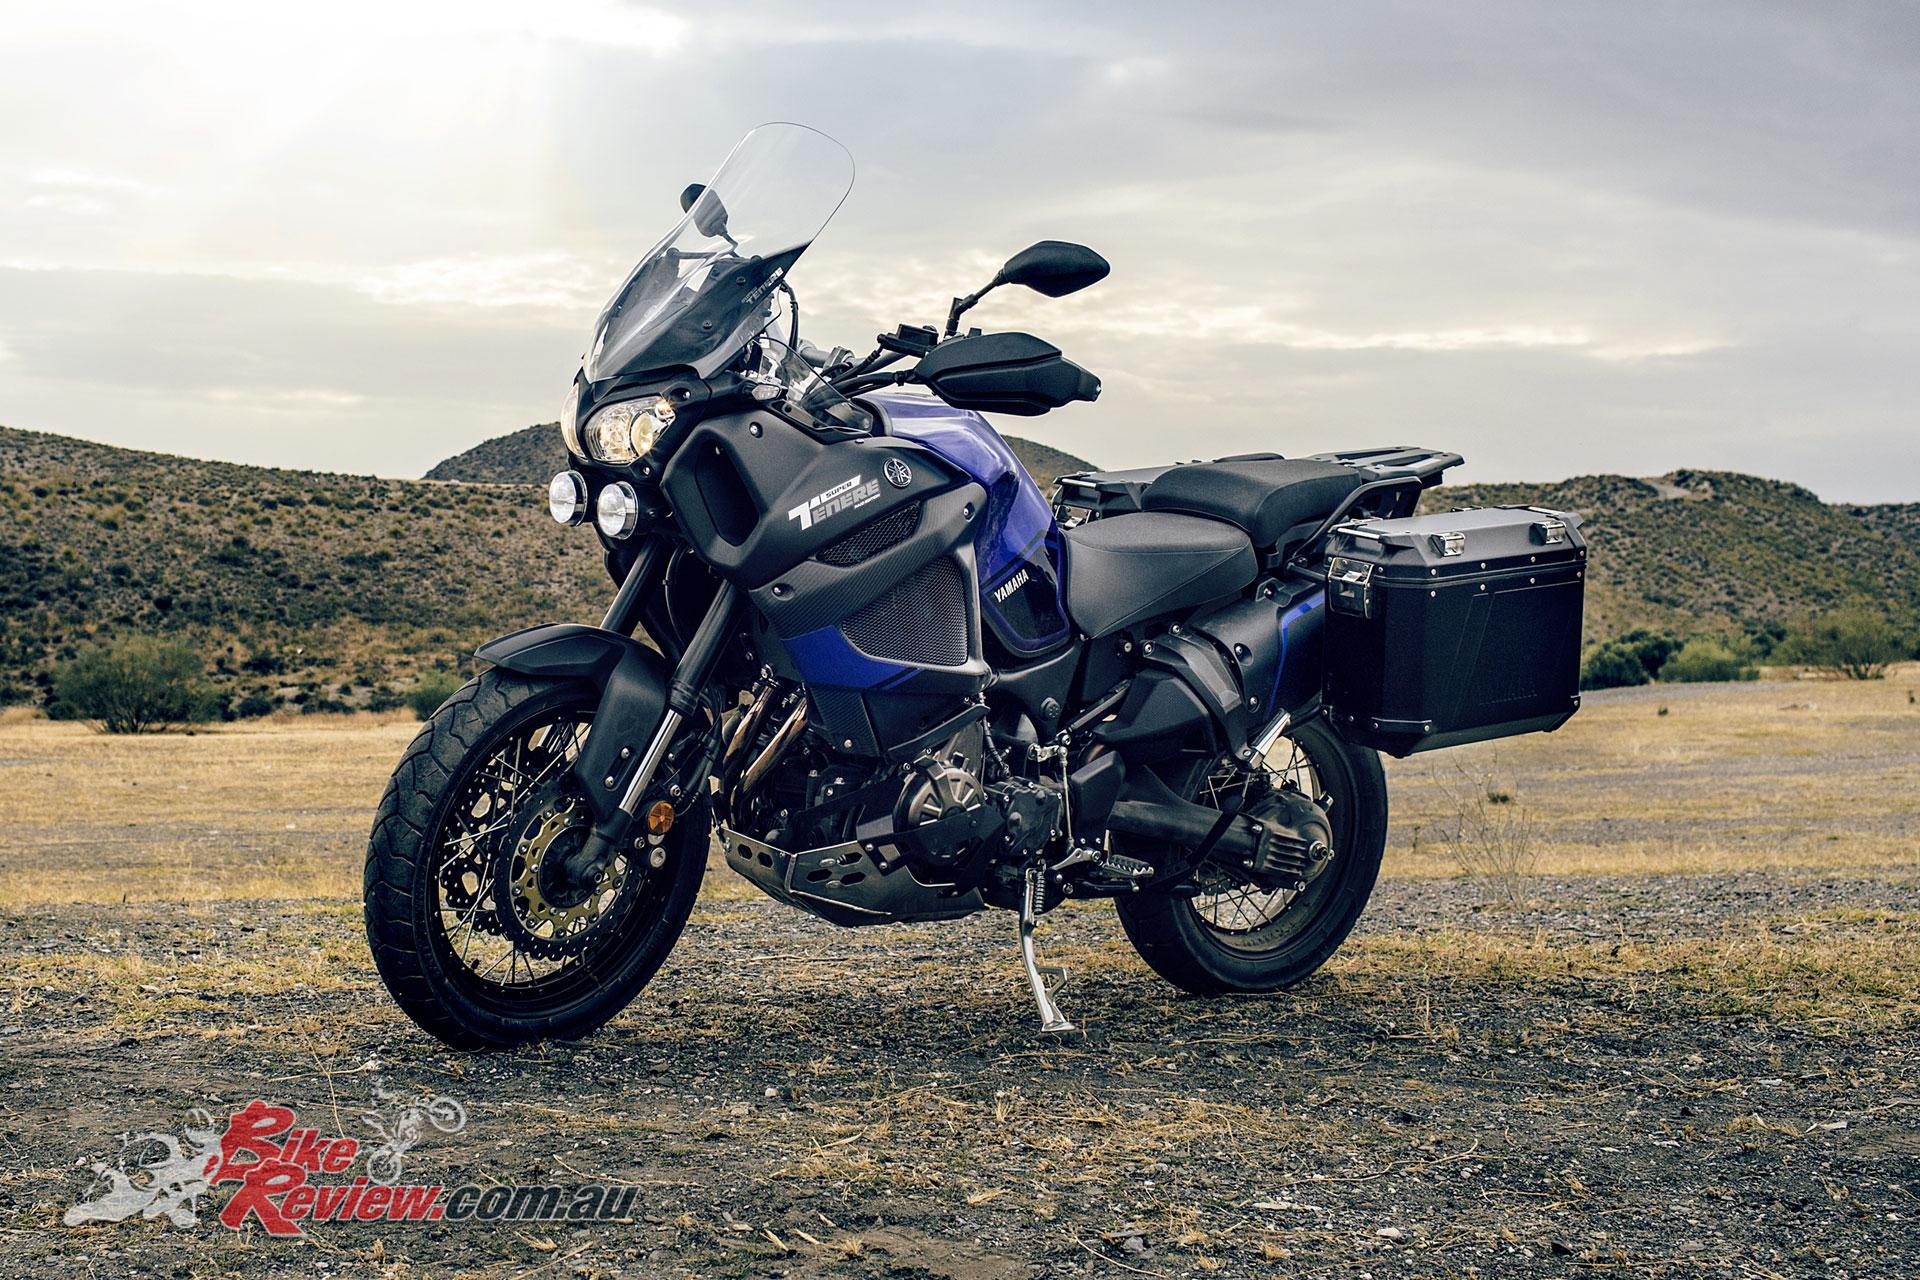 2018 Yamaha Super Tenere Raid Edition